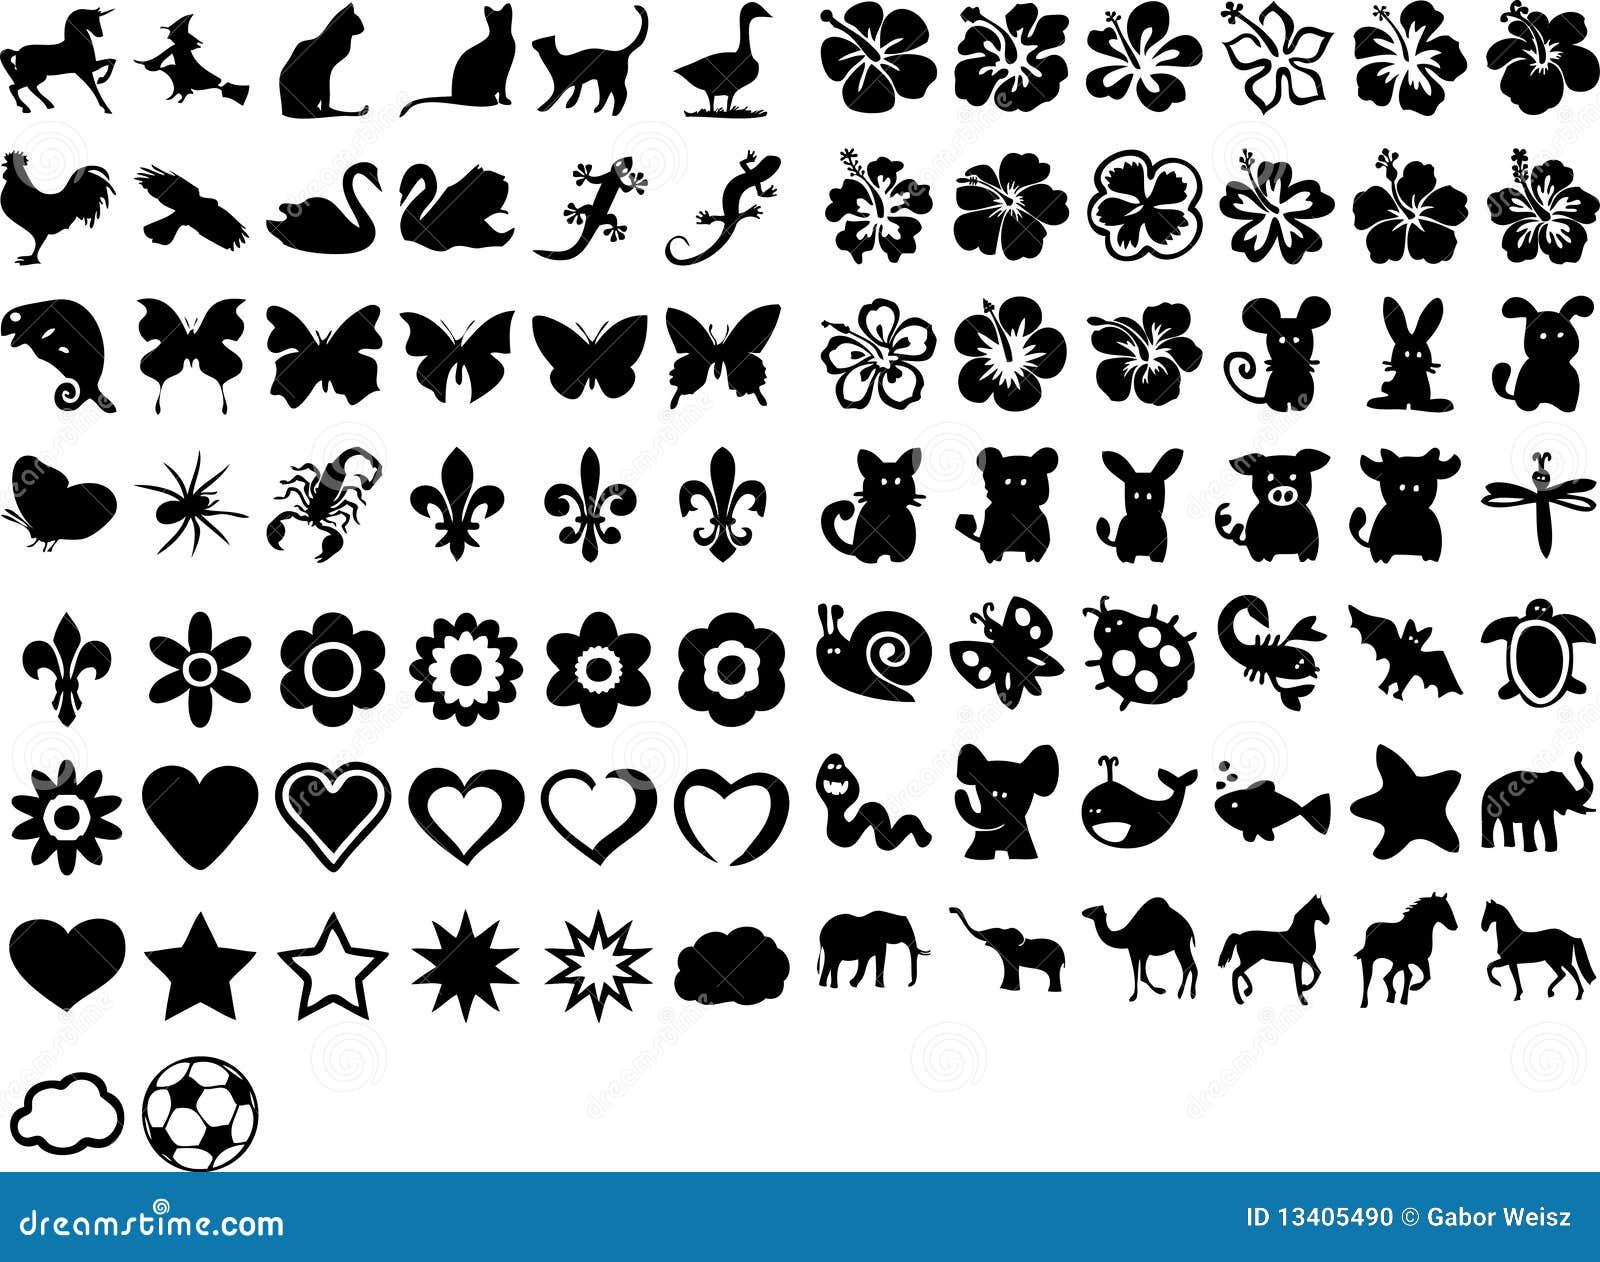 cute symbols stock photo image 13405490 rainbow dash black and white clipart rainbow dash black and white clipart